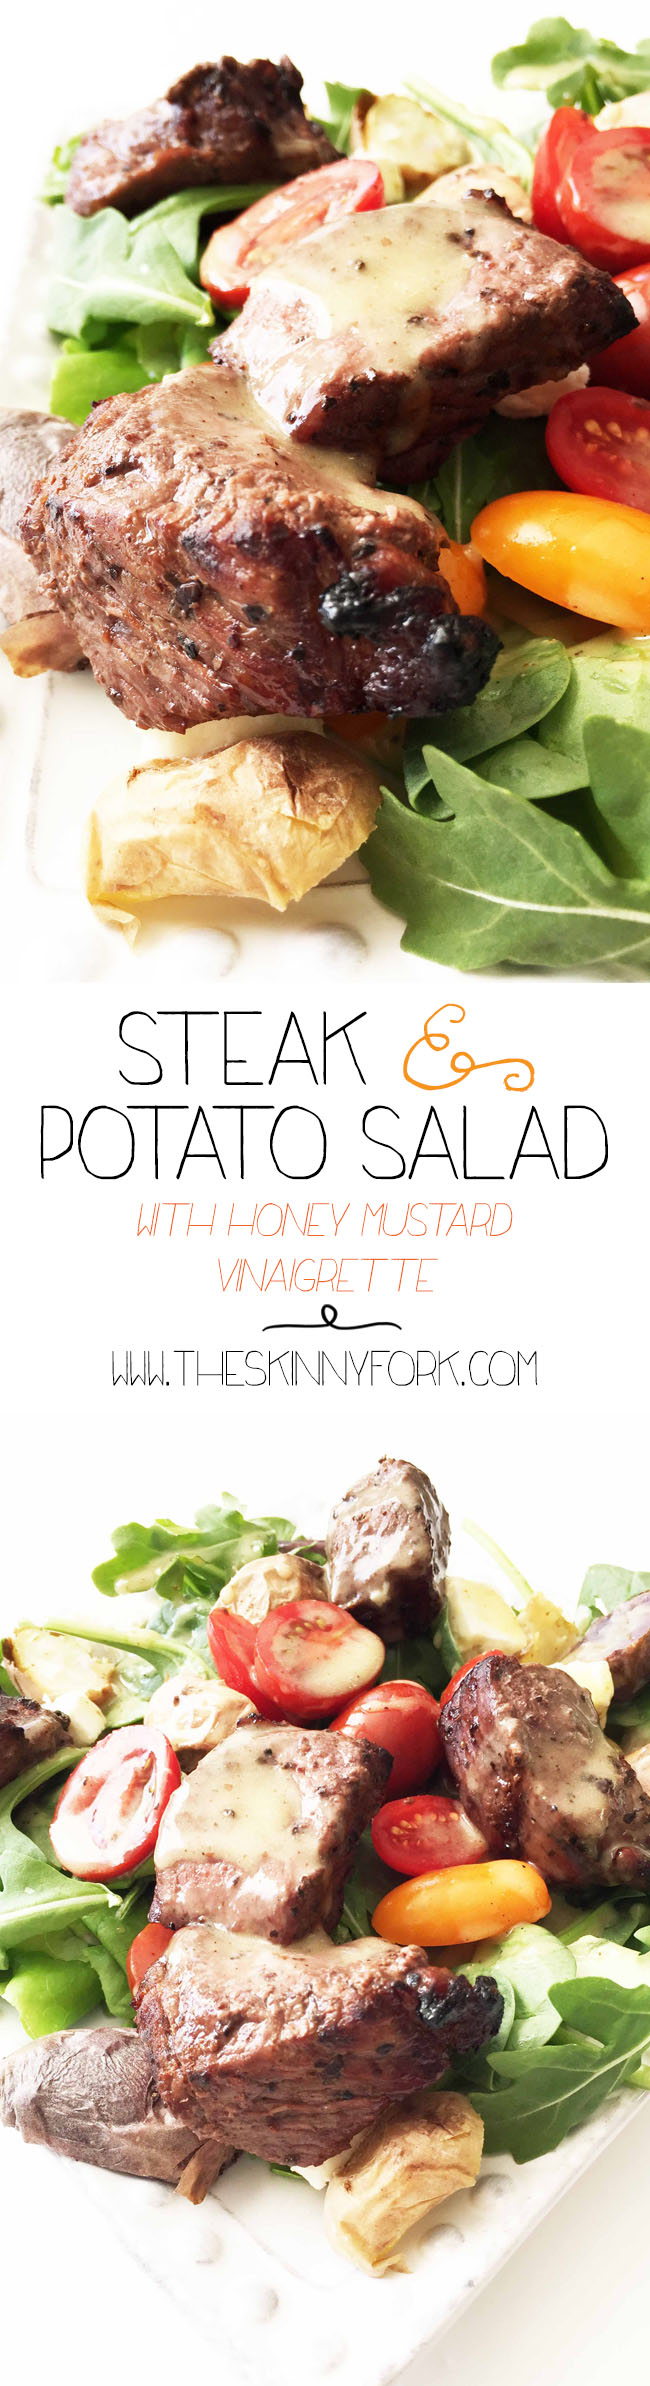 Steak & Potato Salad with Honey Mustard Vinaigrette